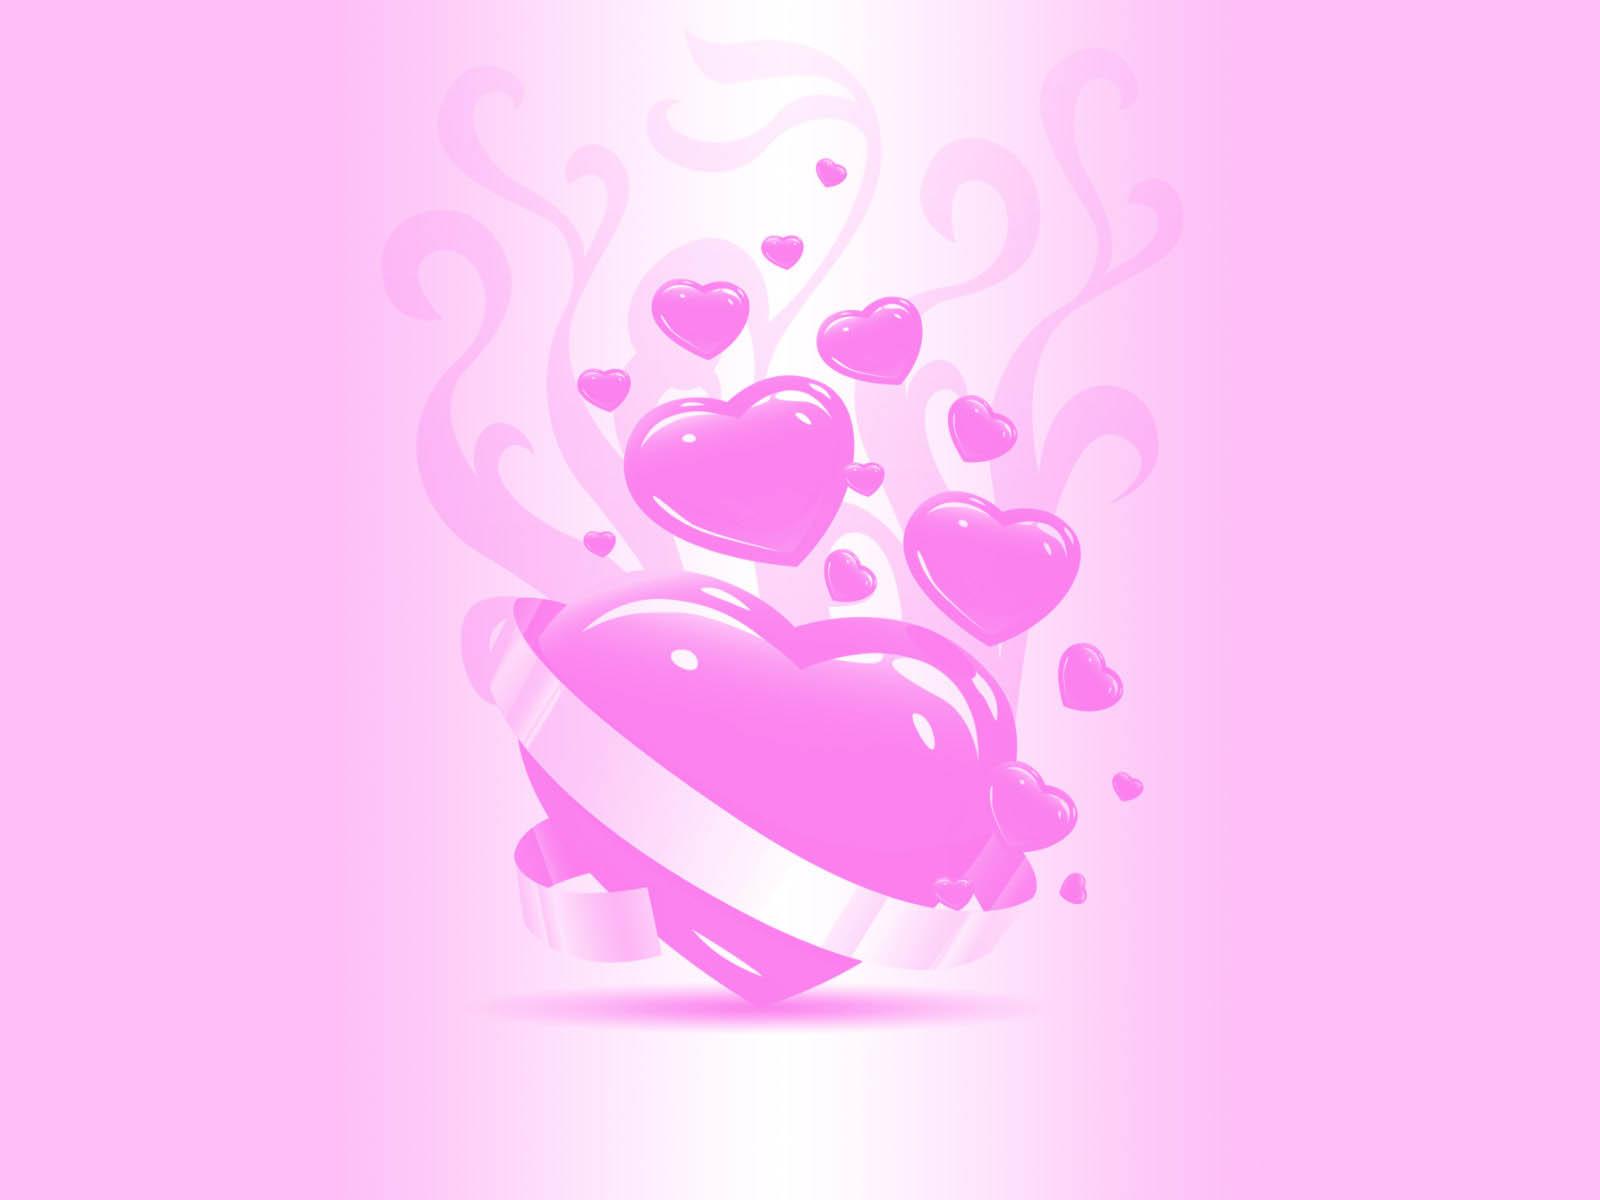 Abstract Pink Wallpapers ~ Desktop Wallpaper  Abstract